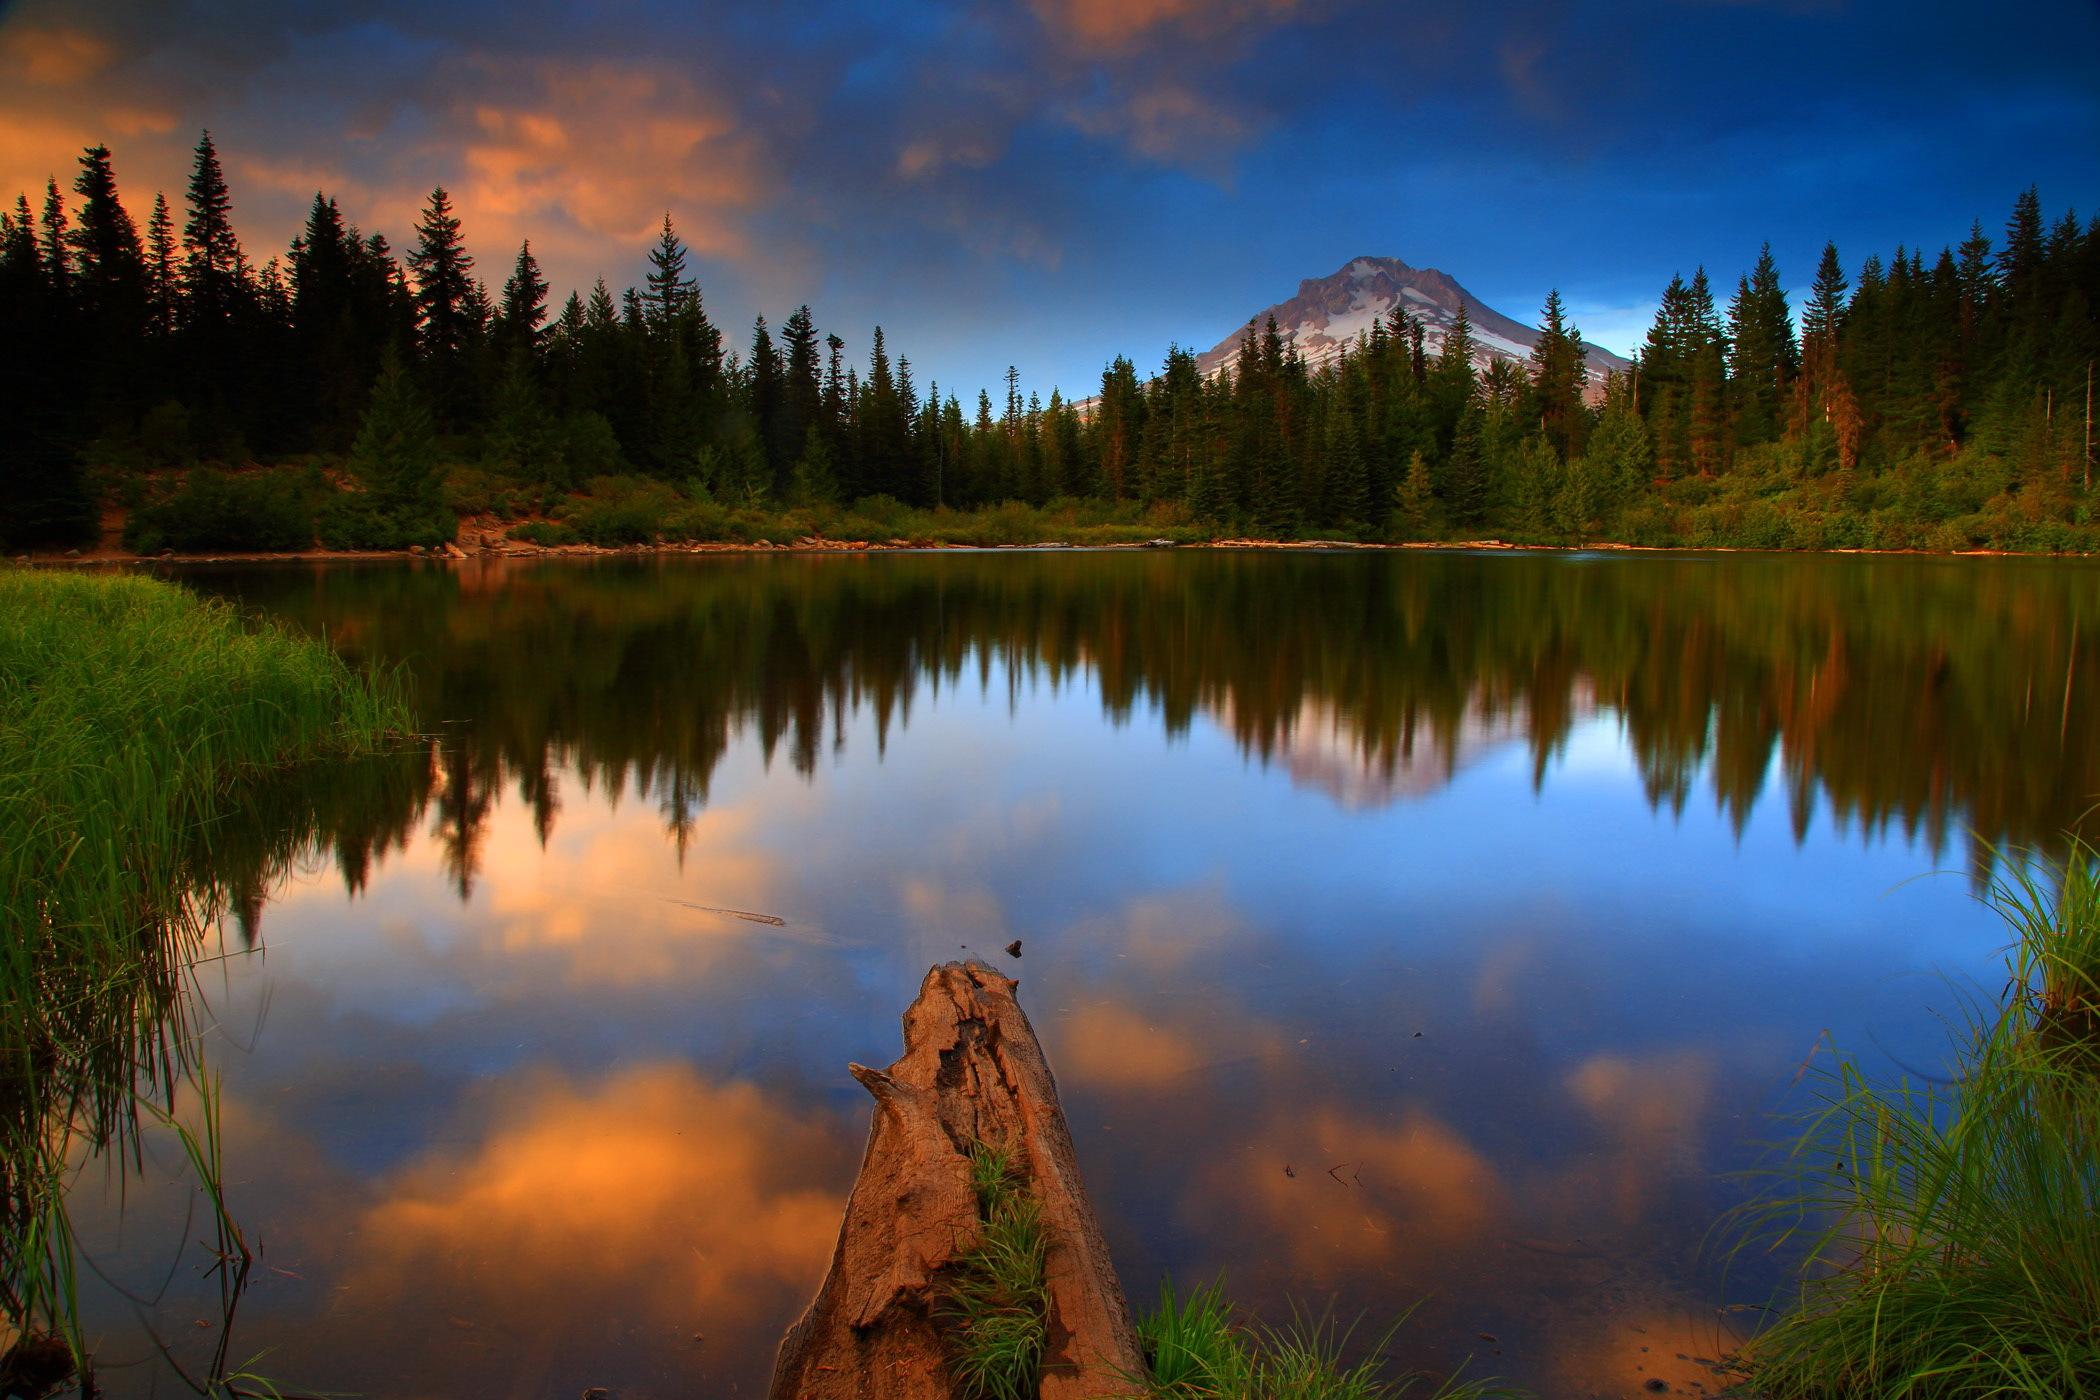 Oregon Wallpapers Hd: Oregon Scenery Wallpaper